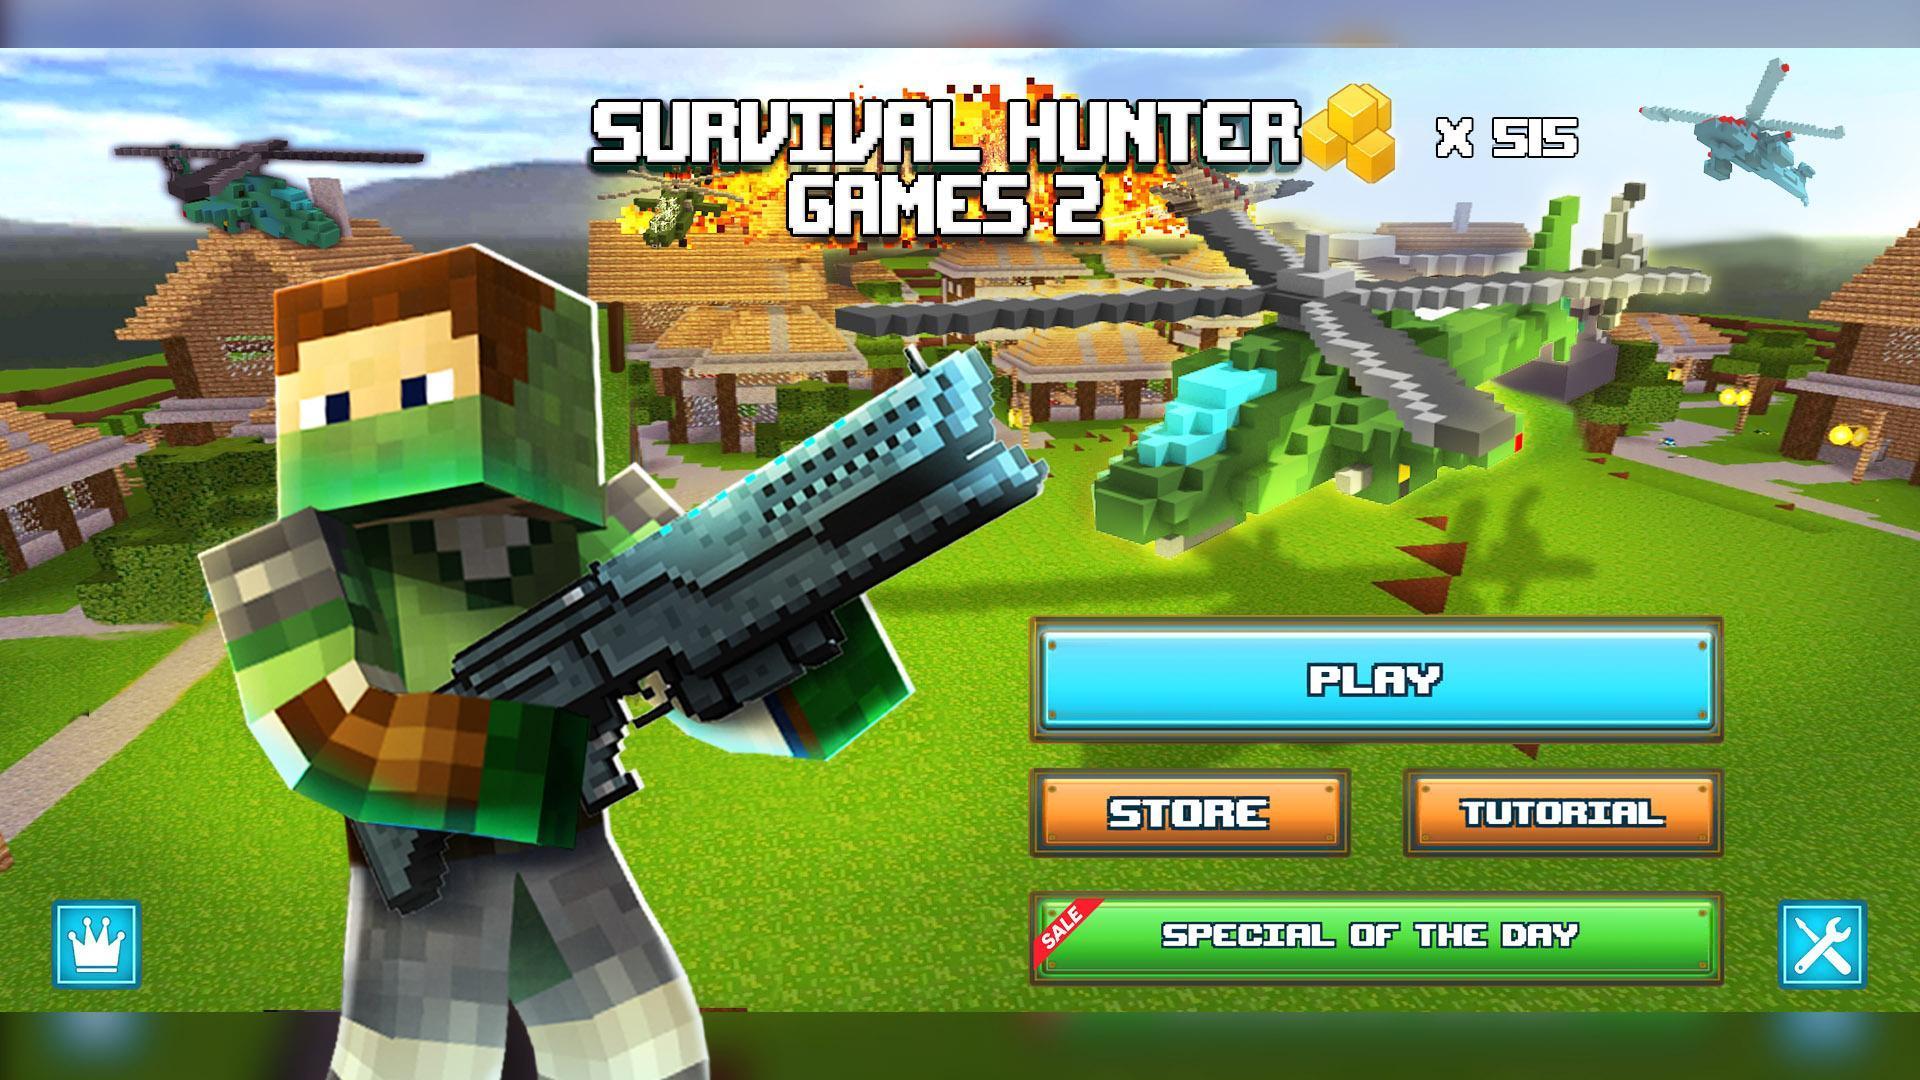 The Survival Hunter Games 2 1.136 Screenshot 4